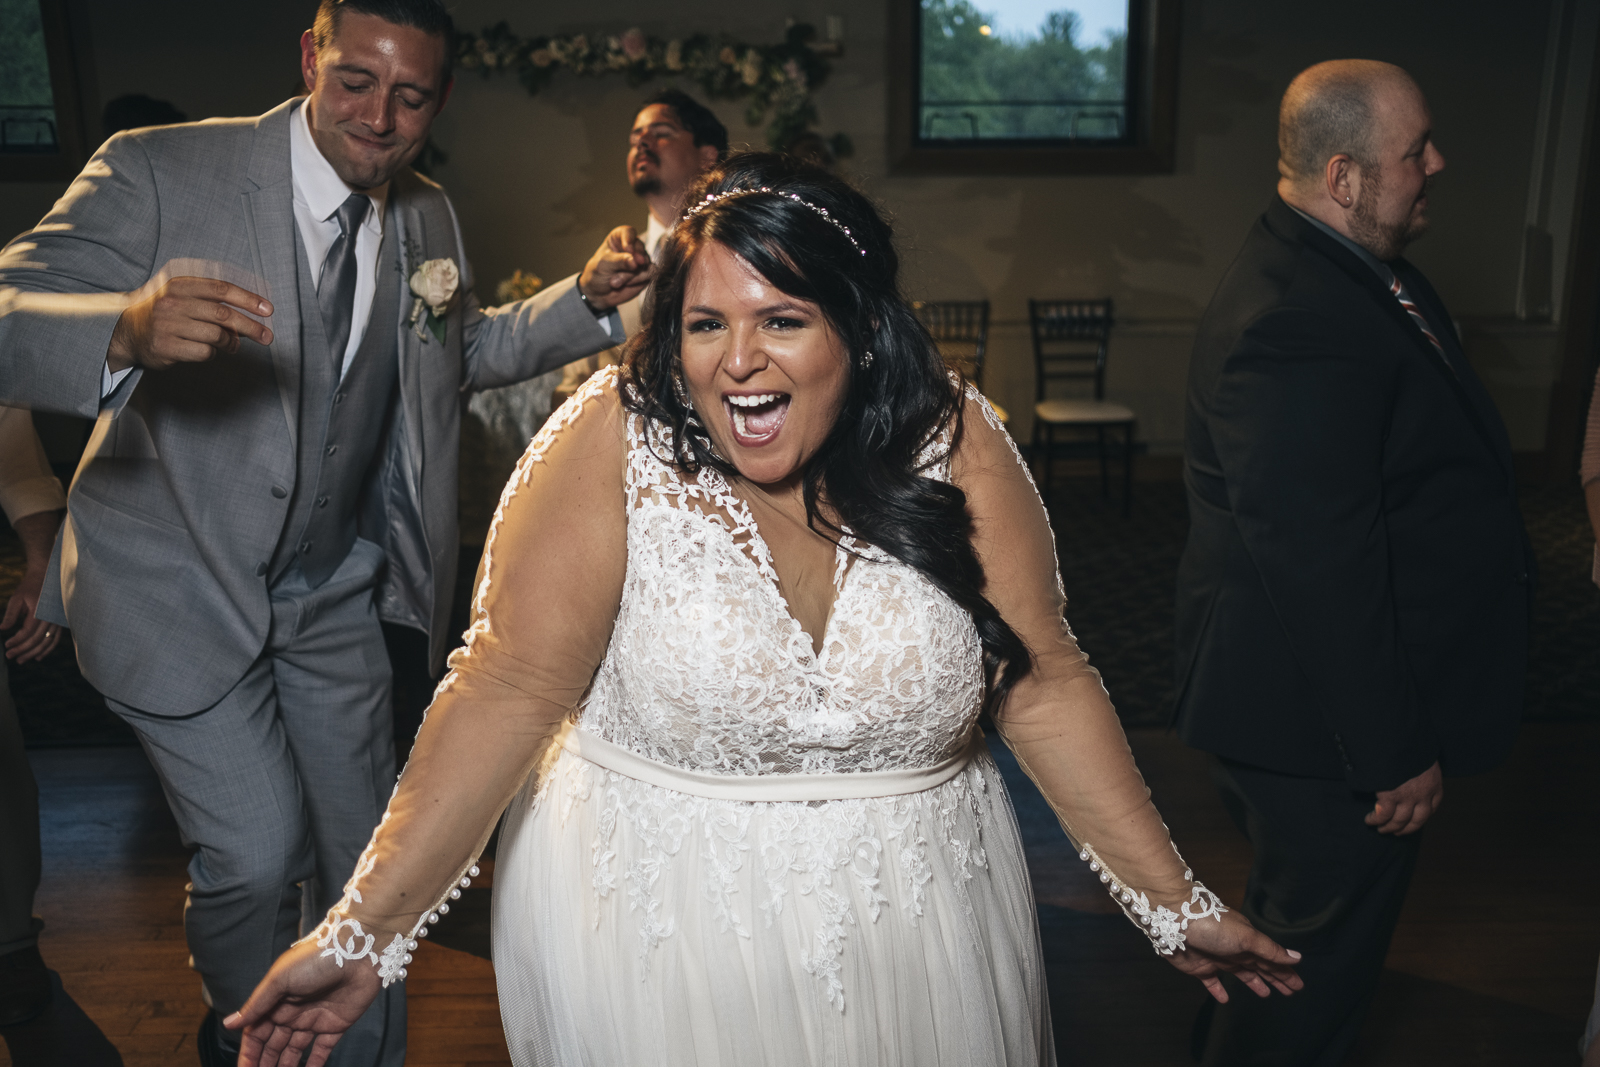 Bride dancing to bookthatdj.com wedding DJ at Nazareth Hall.